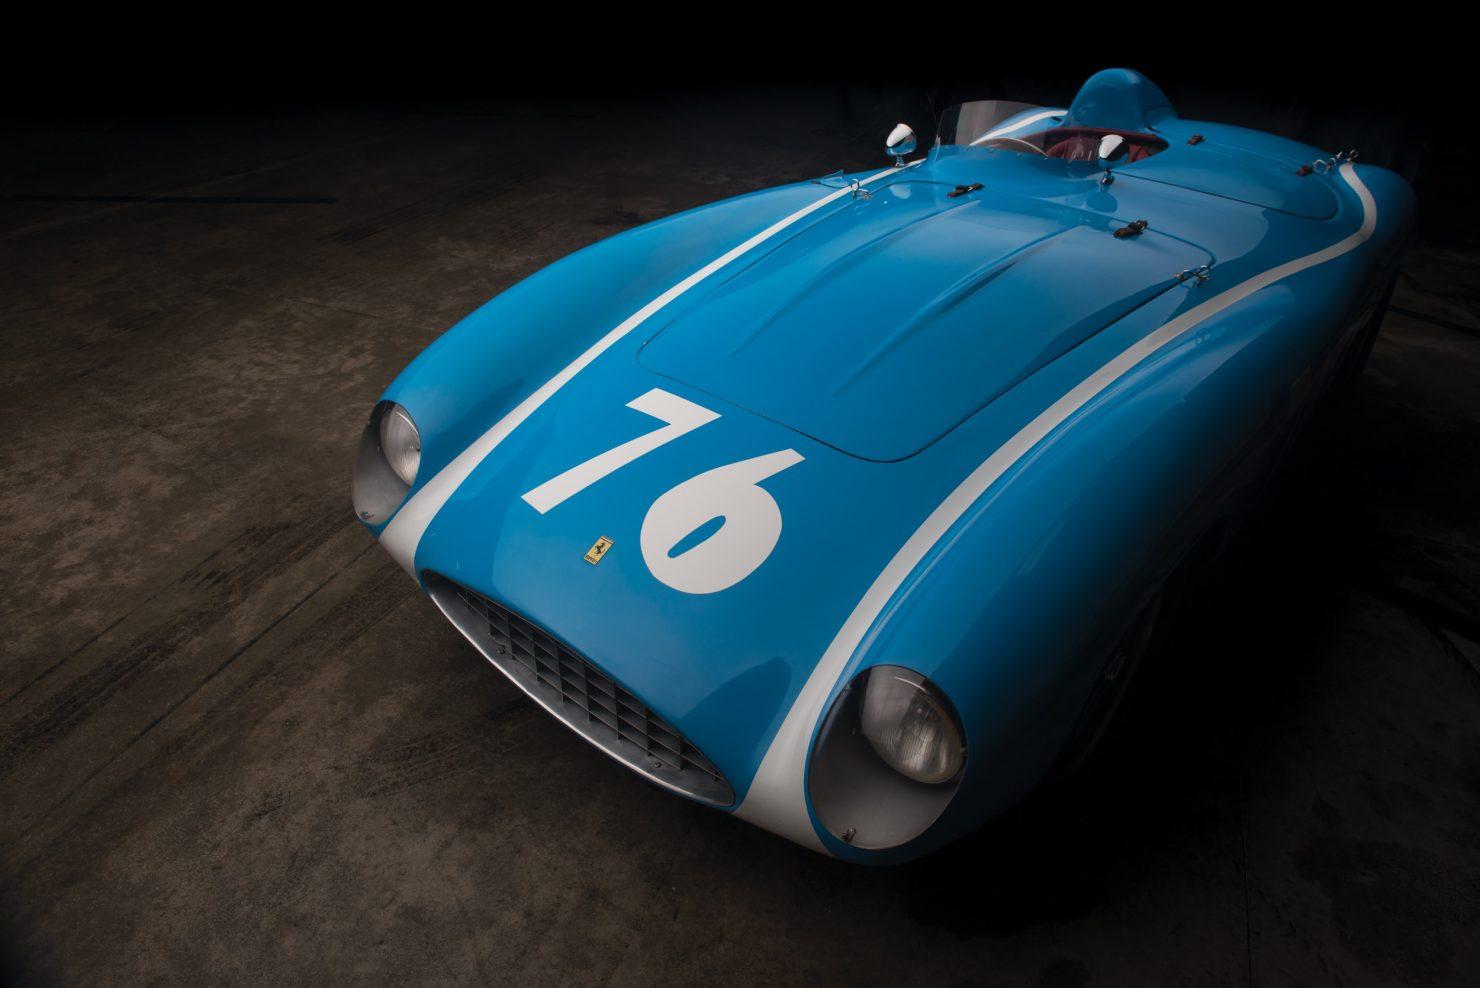 ferrari 121 lm spider 12 1480x988 - 1955 Ferrari 121 LM